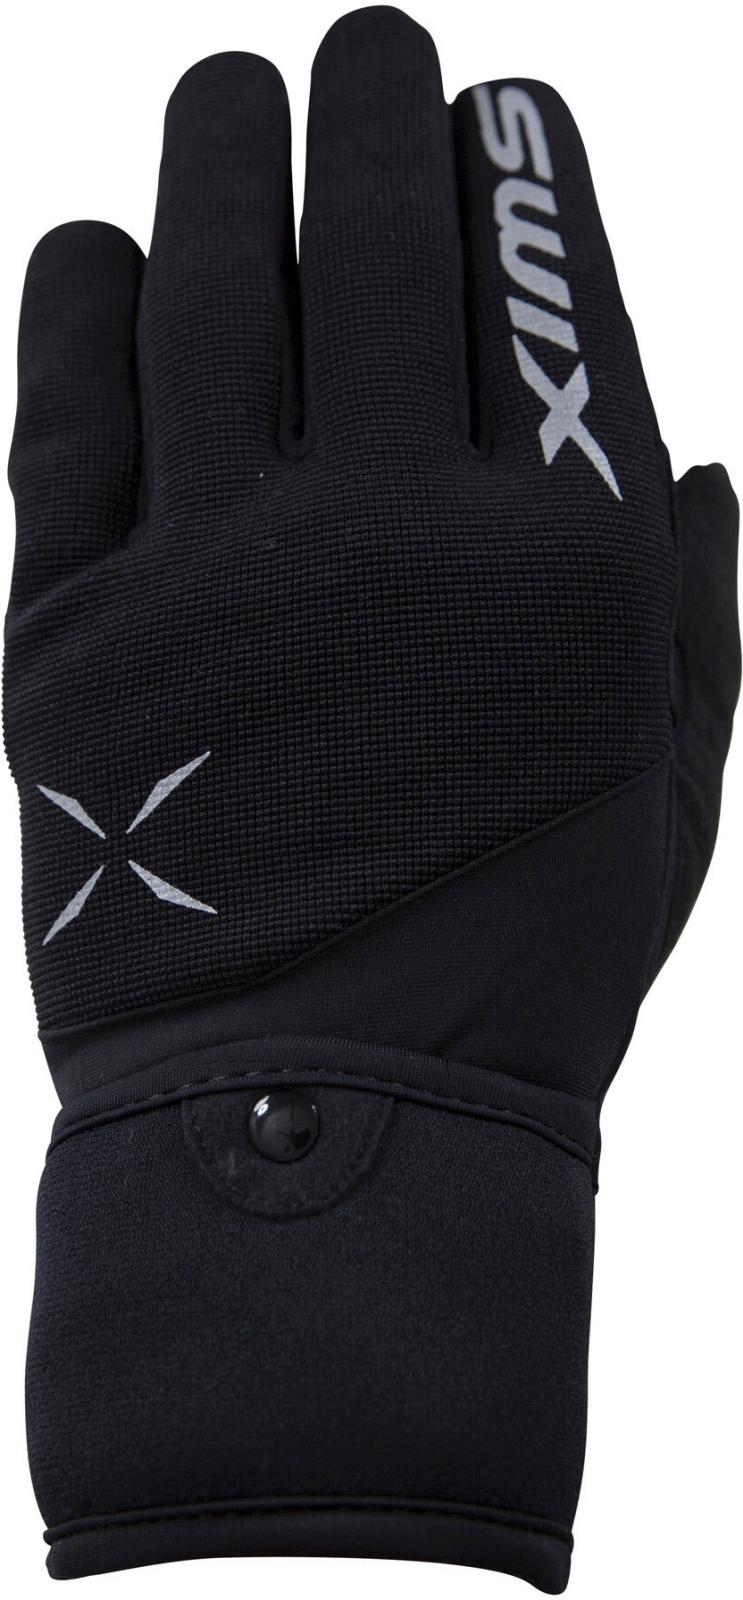 Swix AtlasX - black S